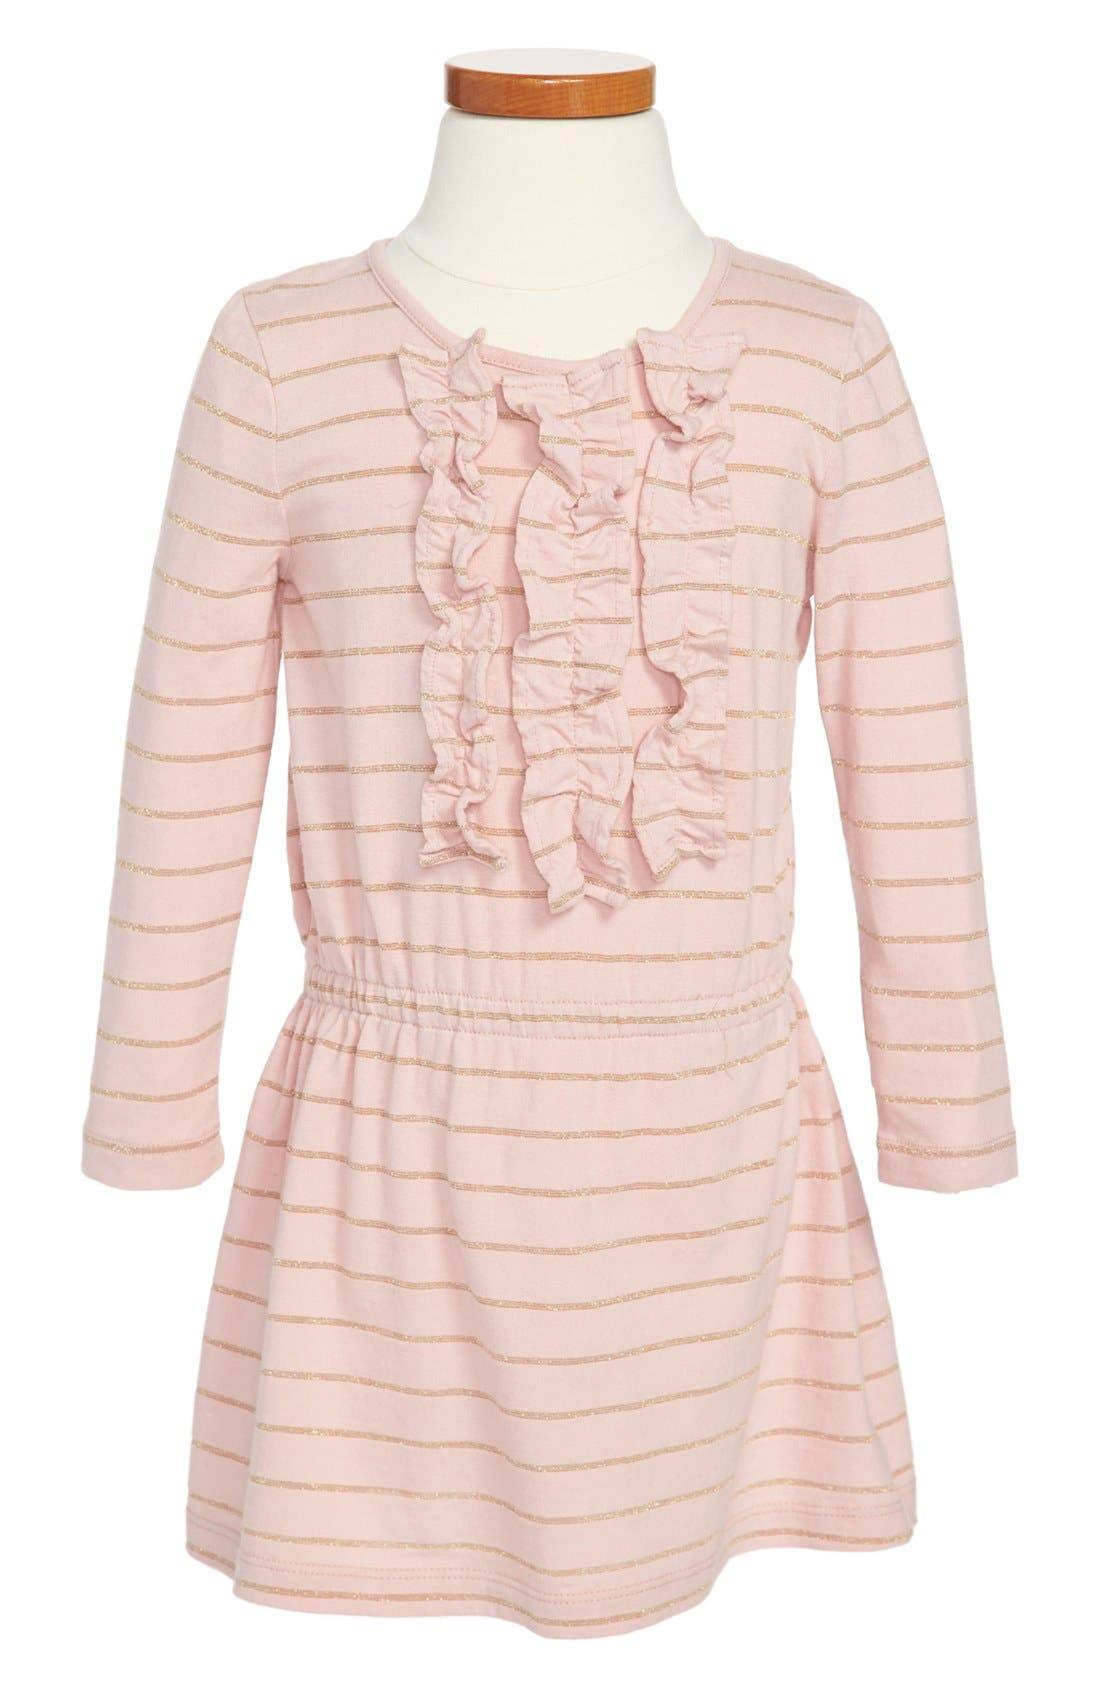 Main Image - Tucker + Tate 'Noelle' Ruffle Dress (Little Girls & Big Girls)